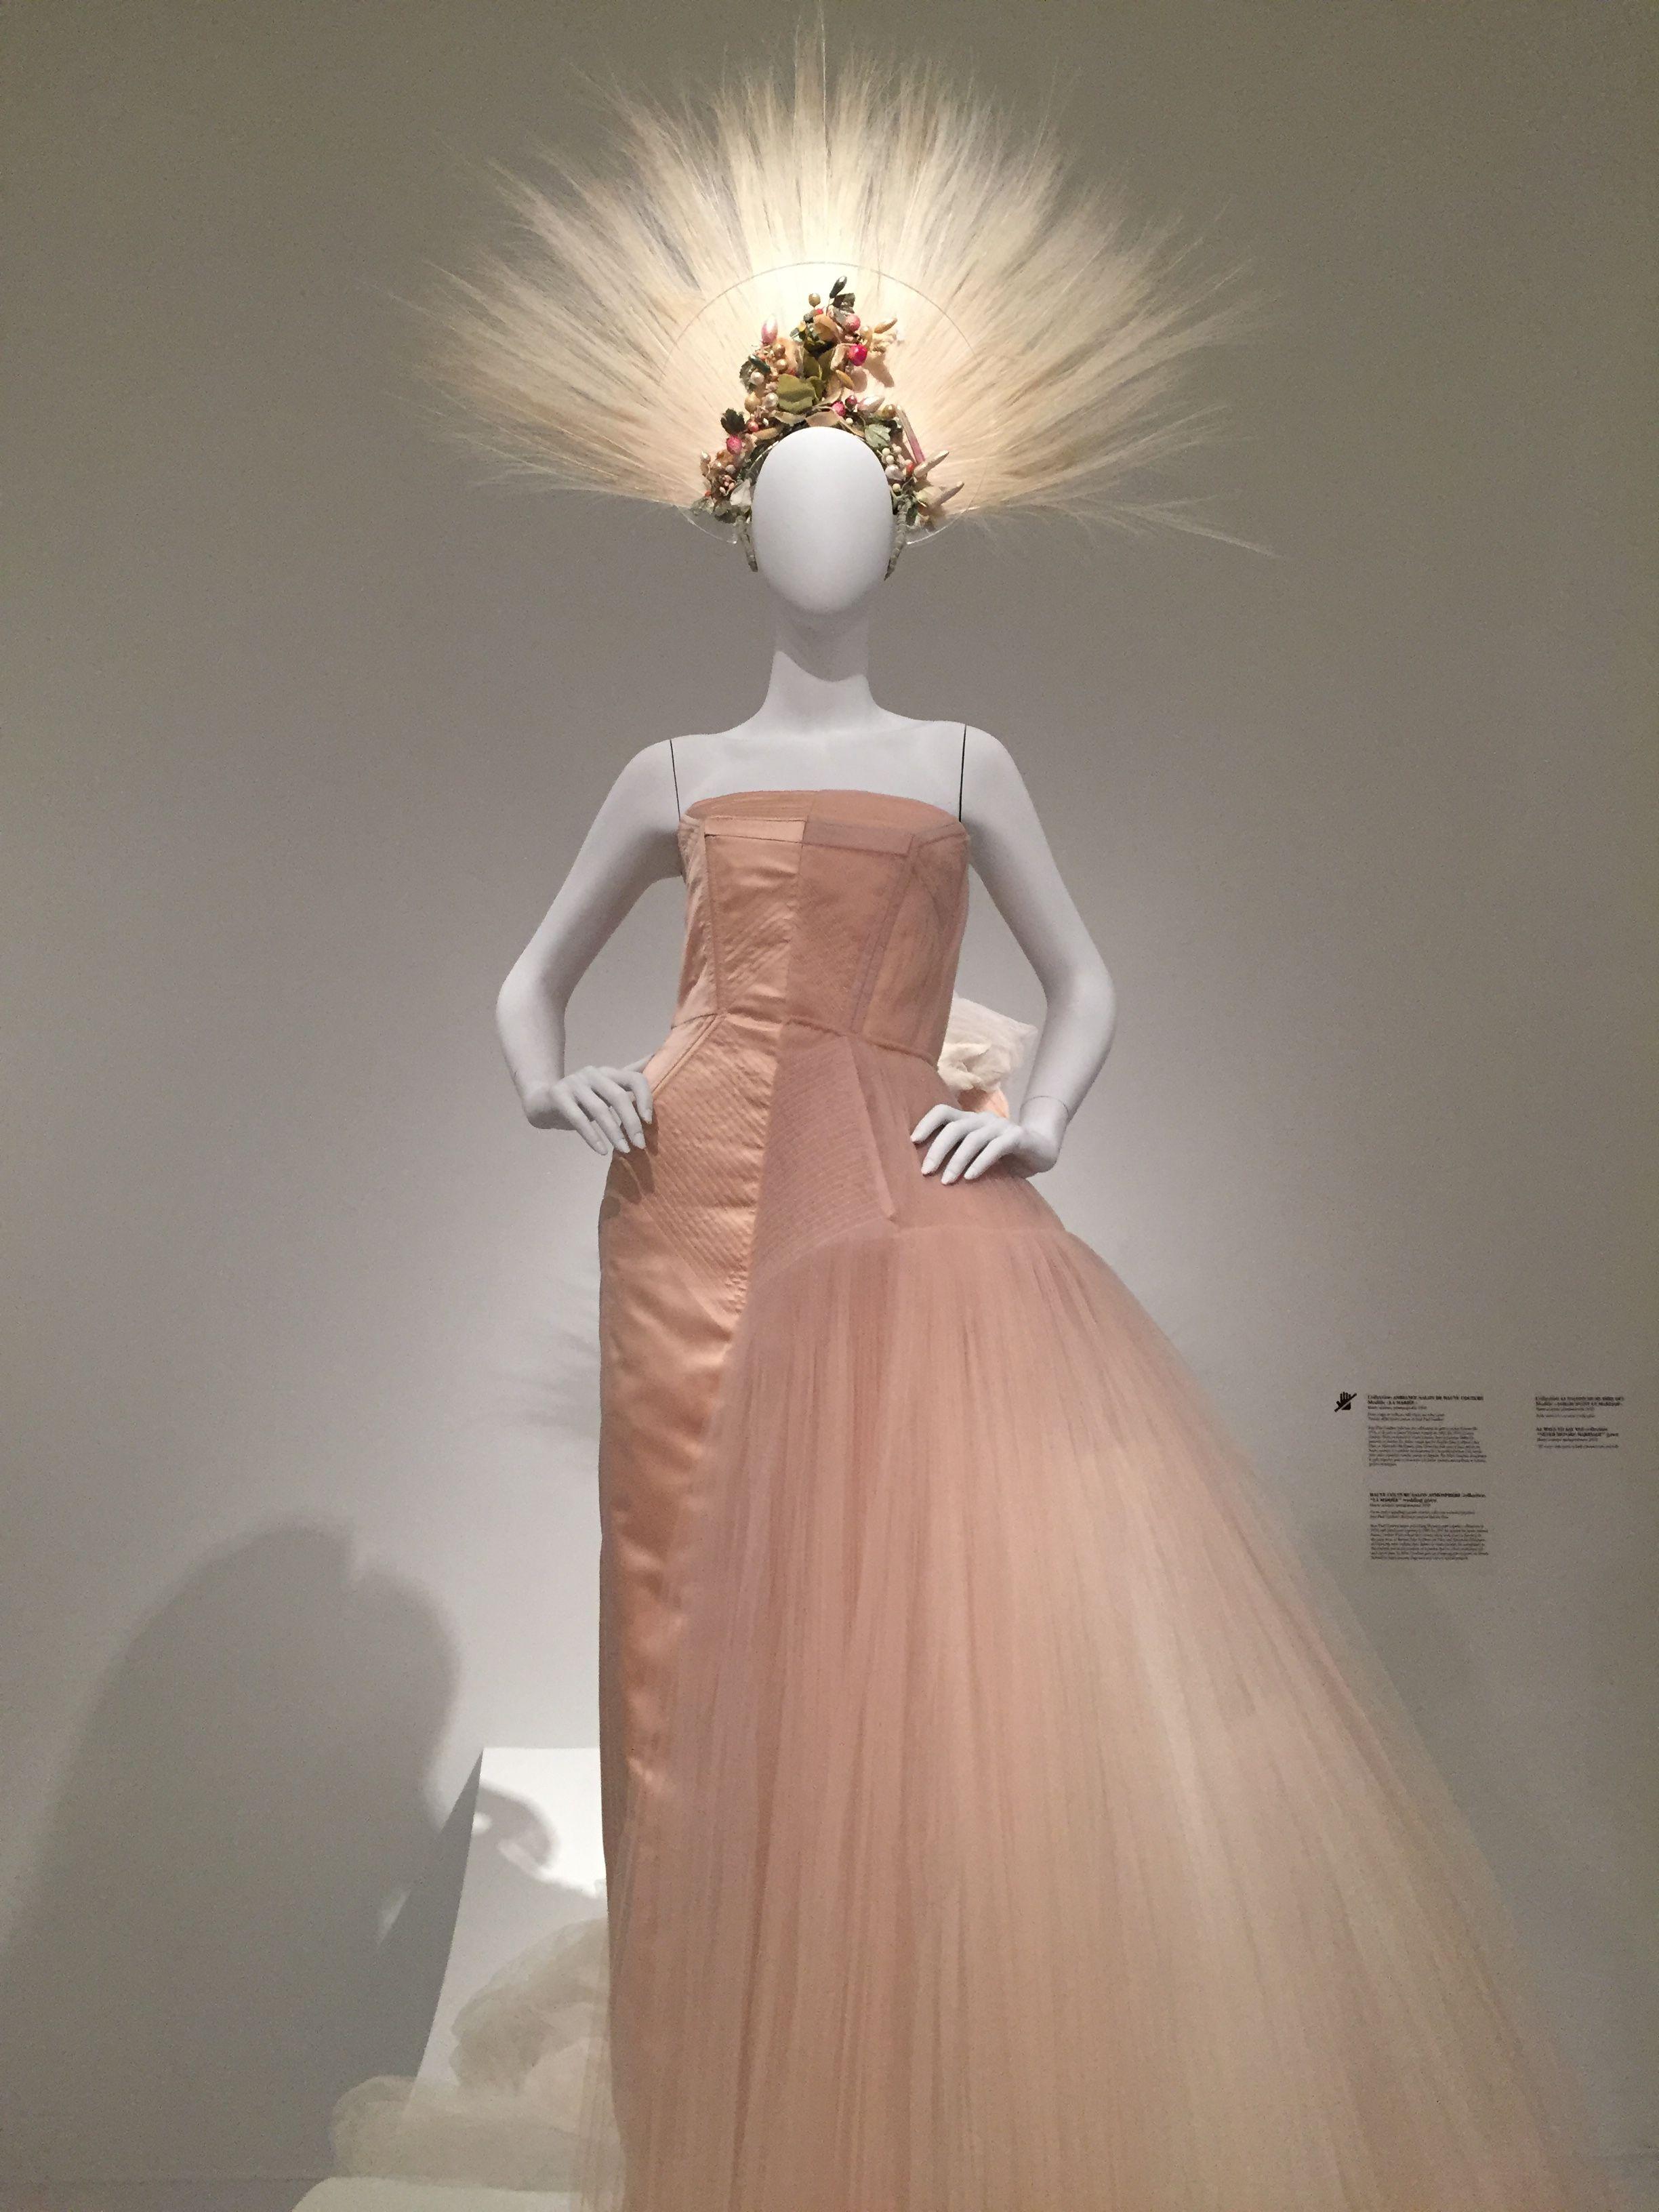 Jean-Paul Gaultier, museum of Toronto